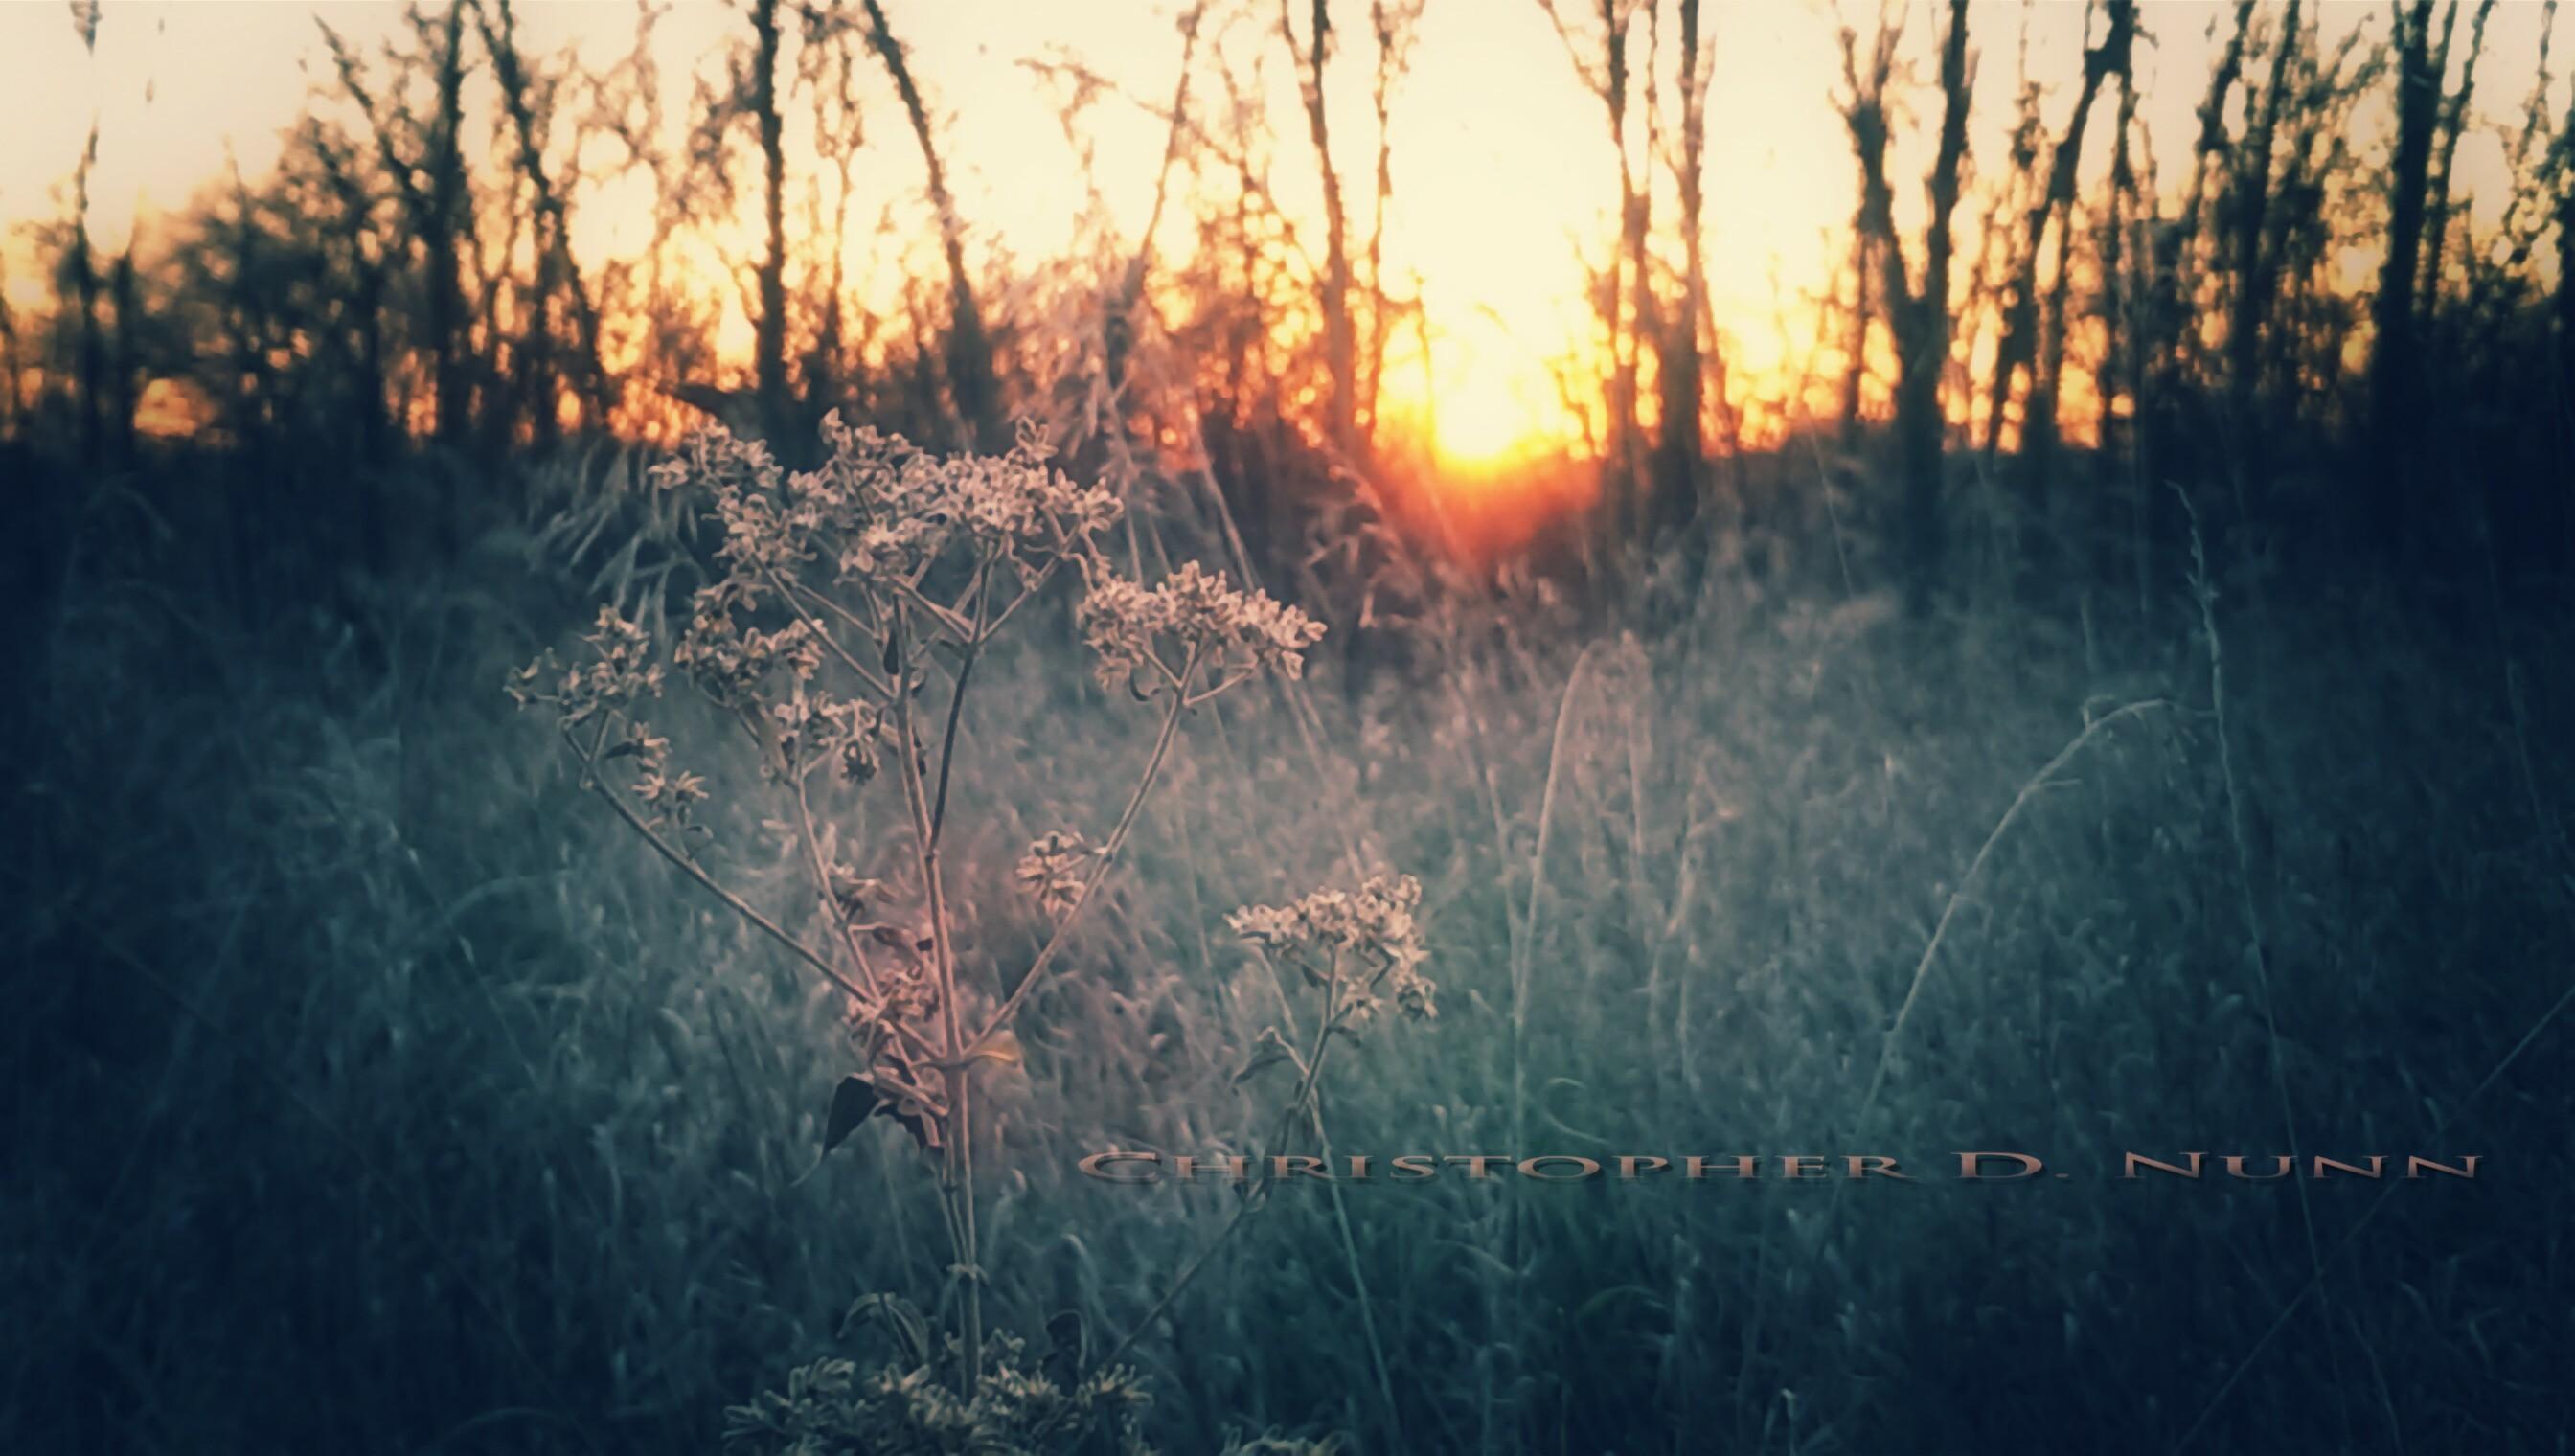 Beauty Even in a Barren Place ~ cDn